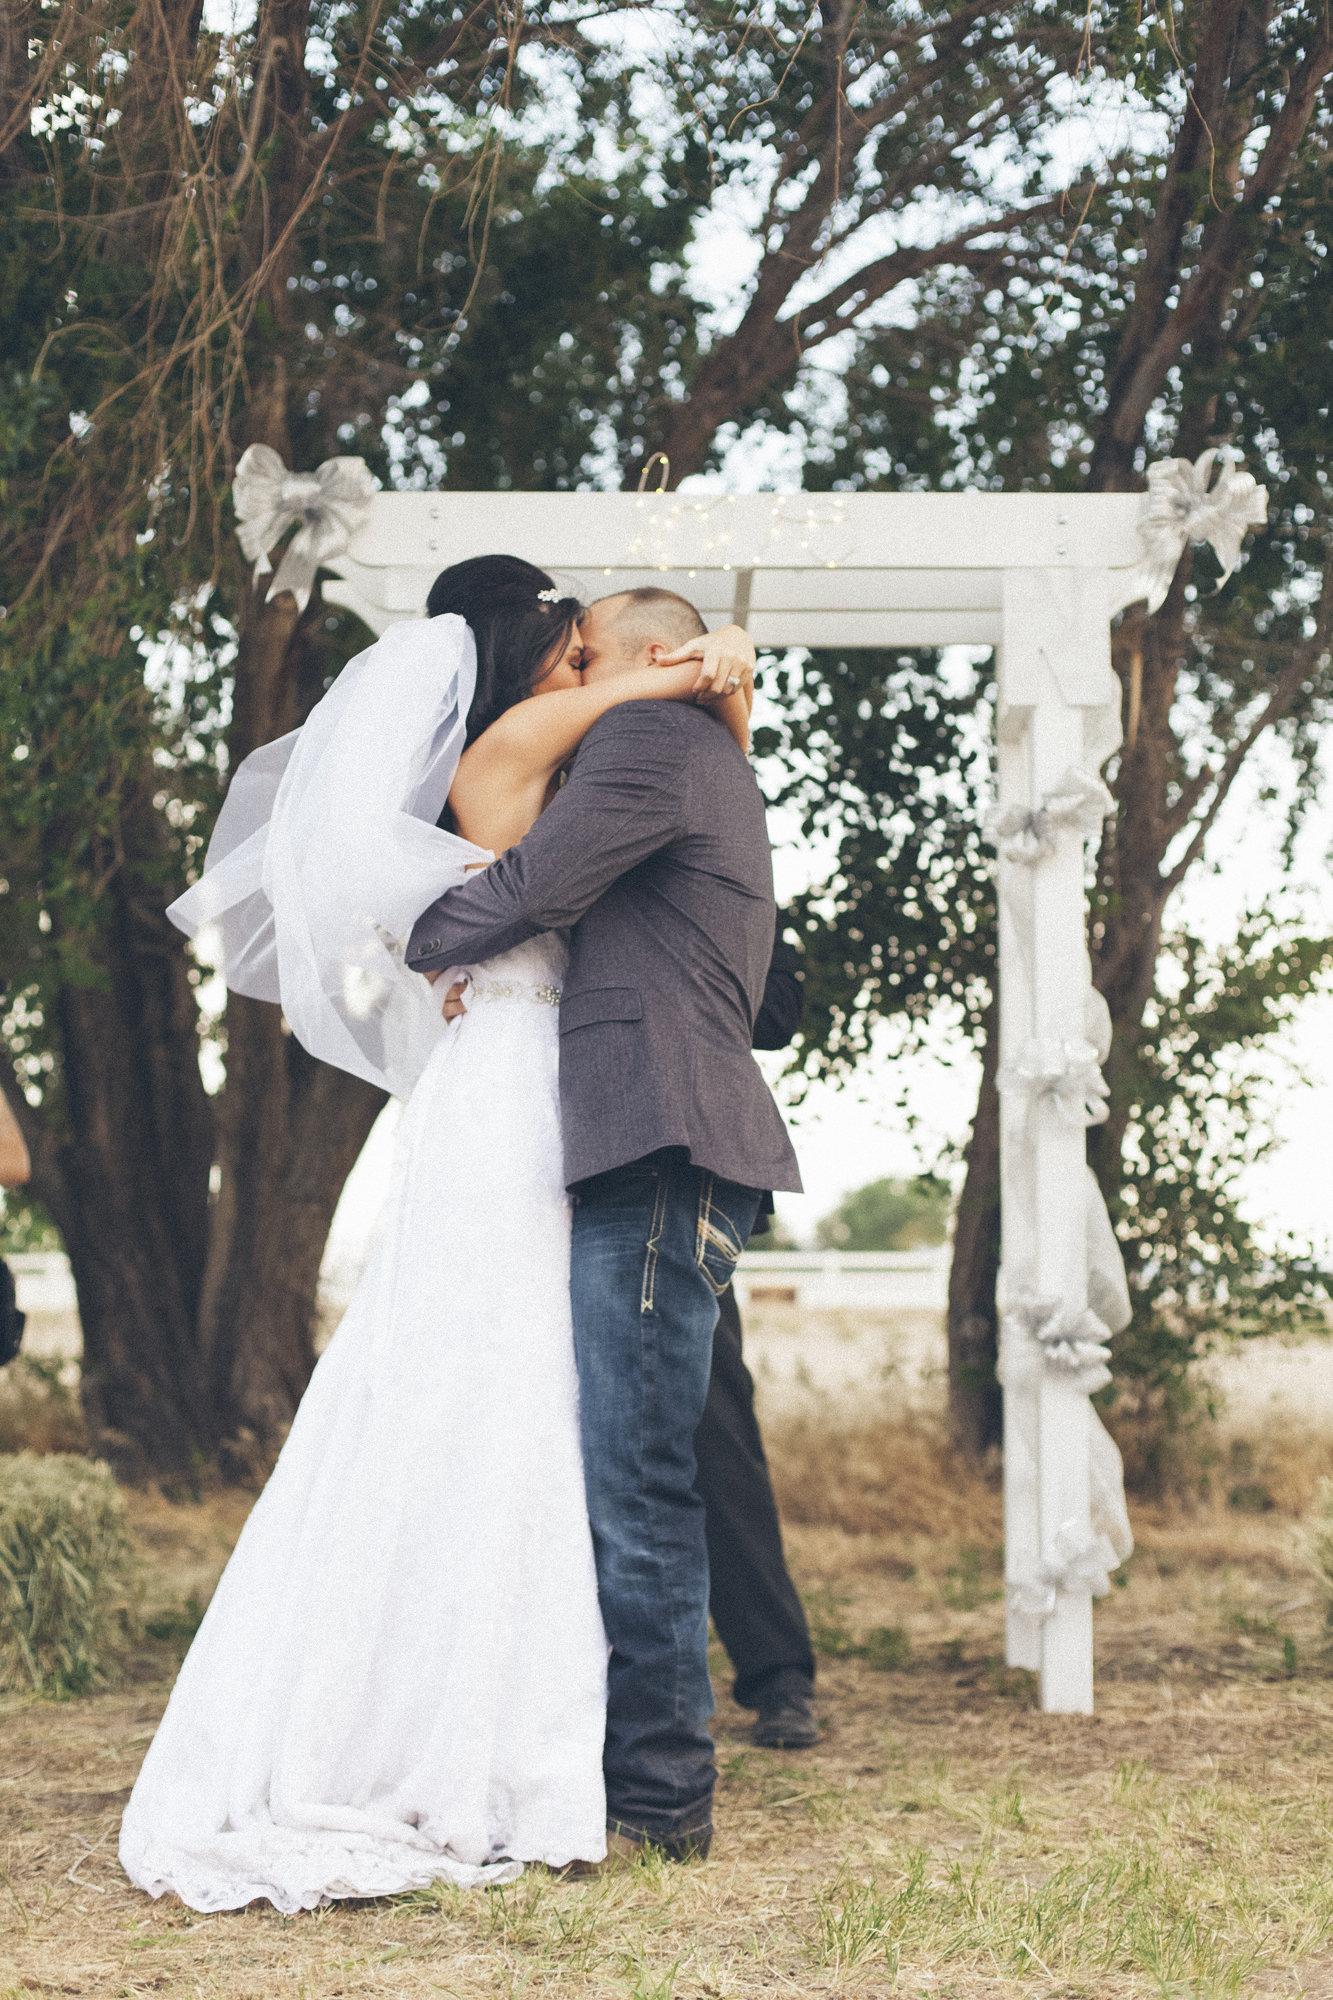 DeMagistris Nunes Wedding-The whole day-0235.jpg